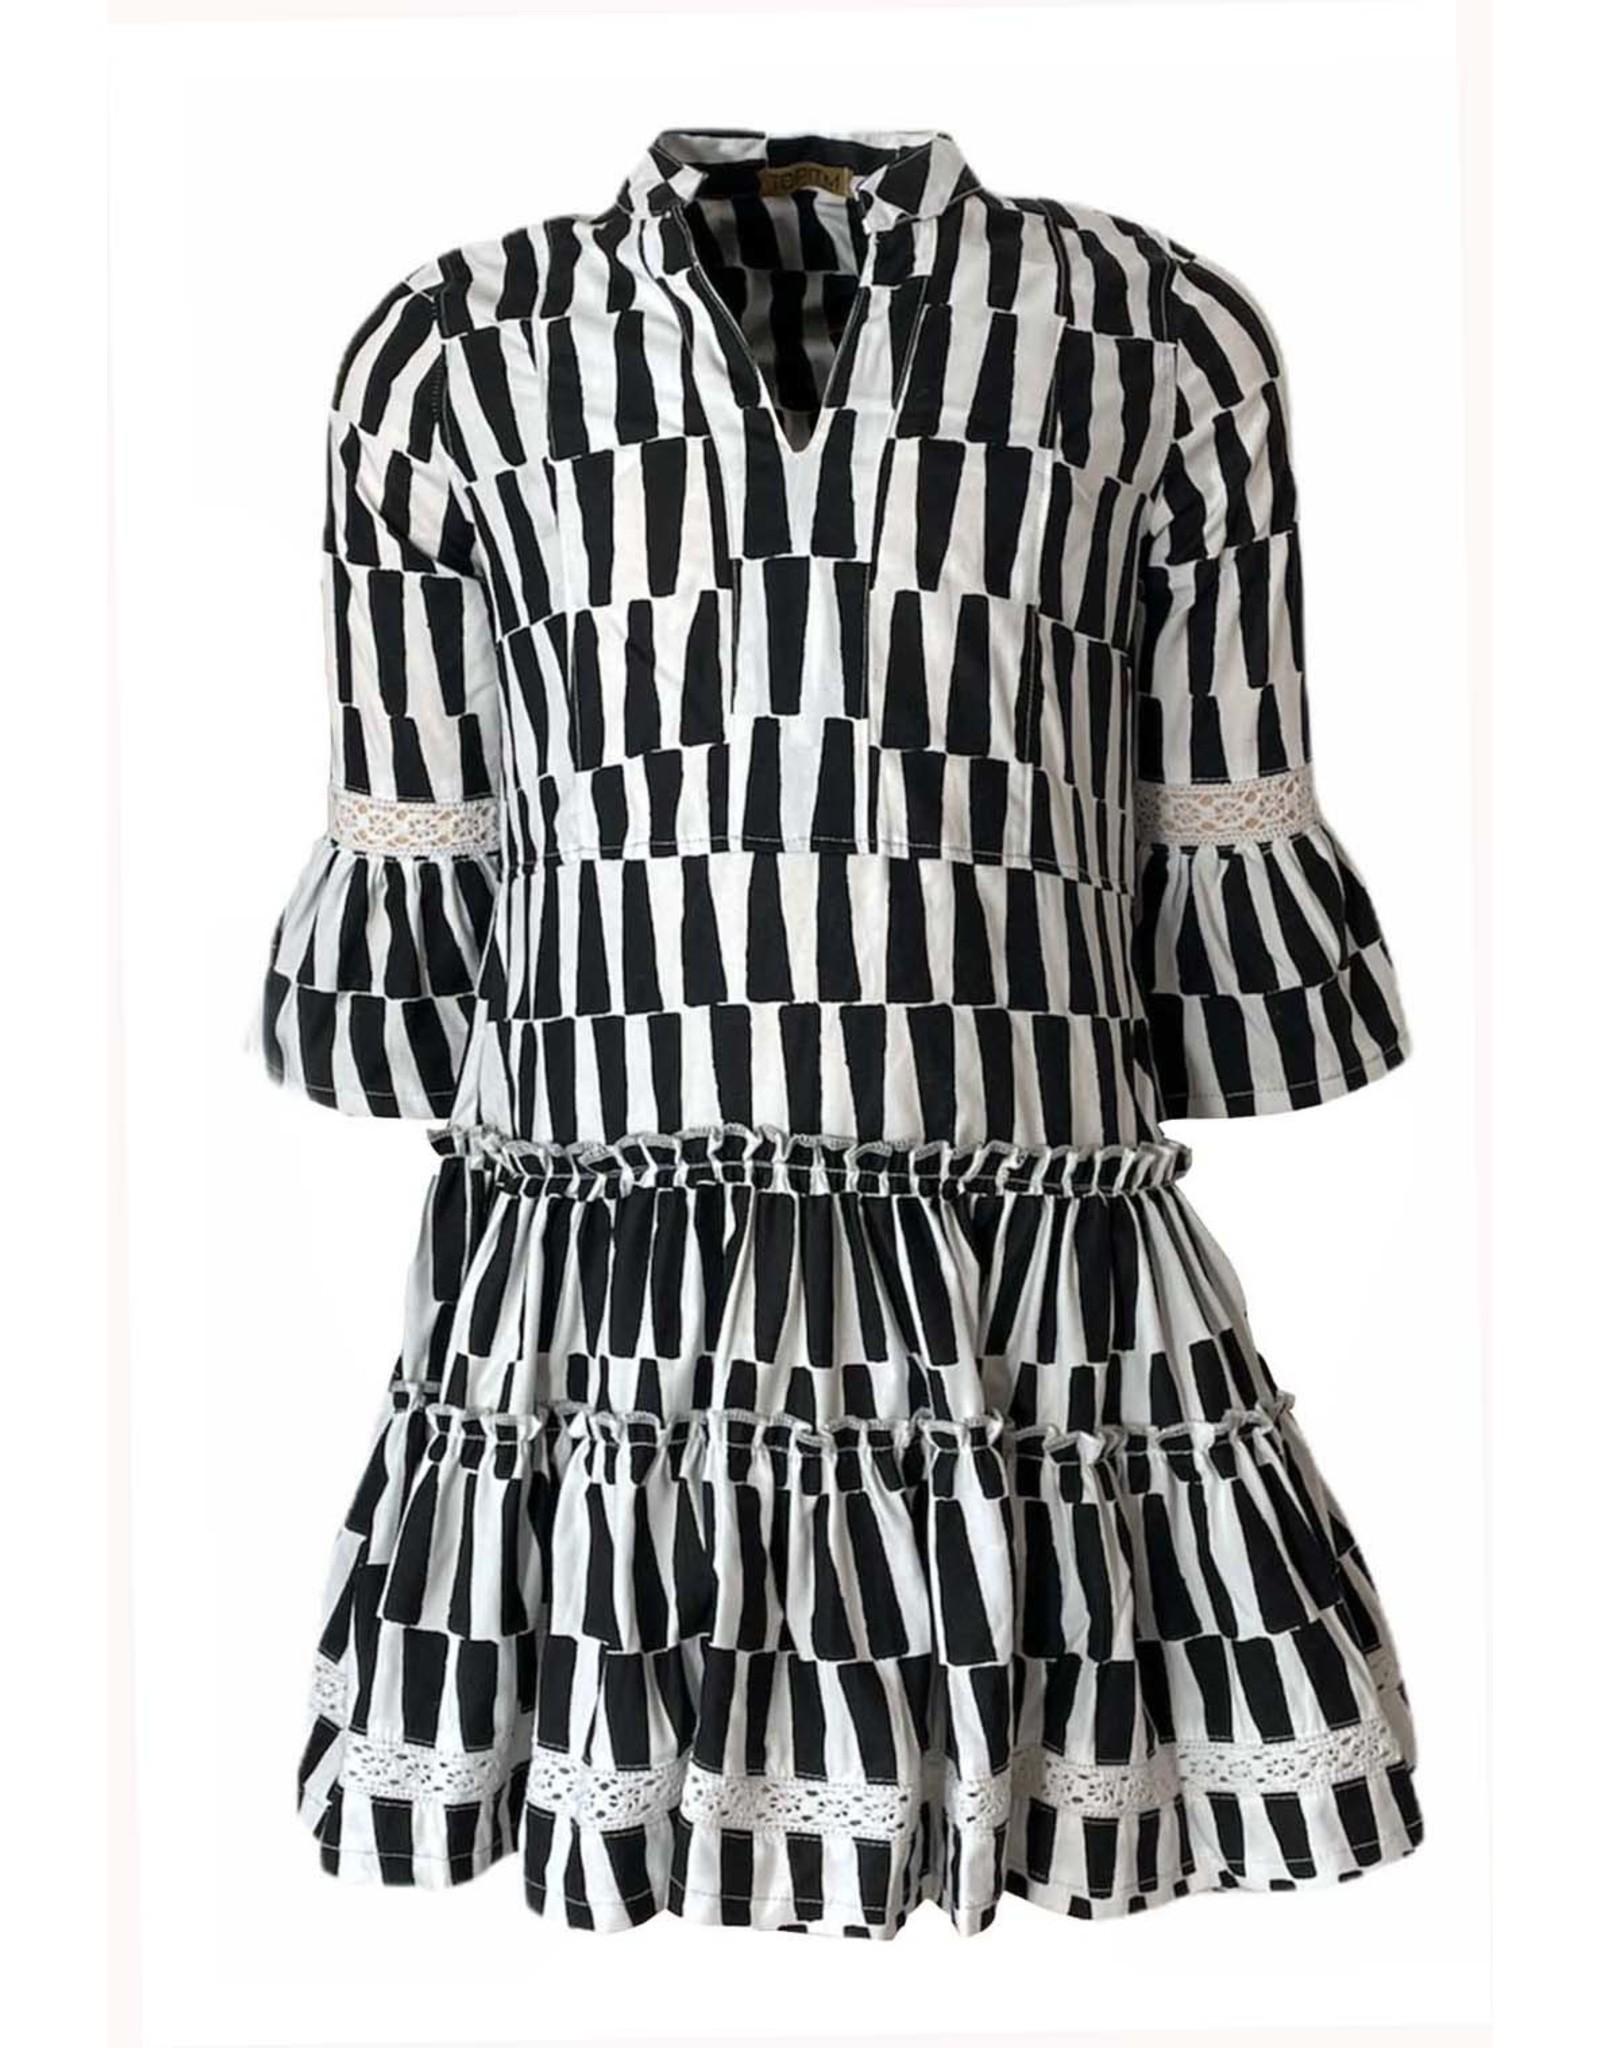 Topitm Zita  dress